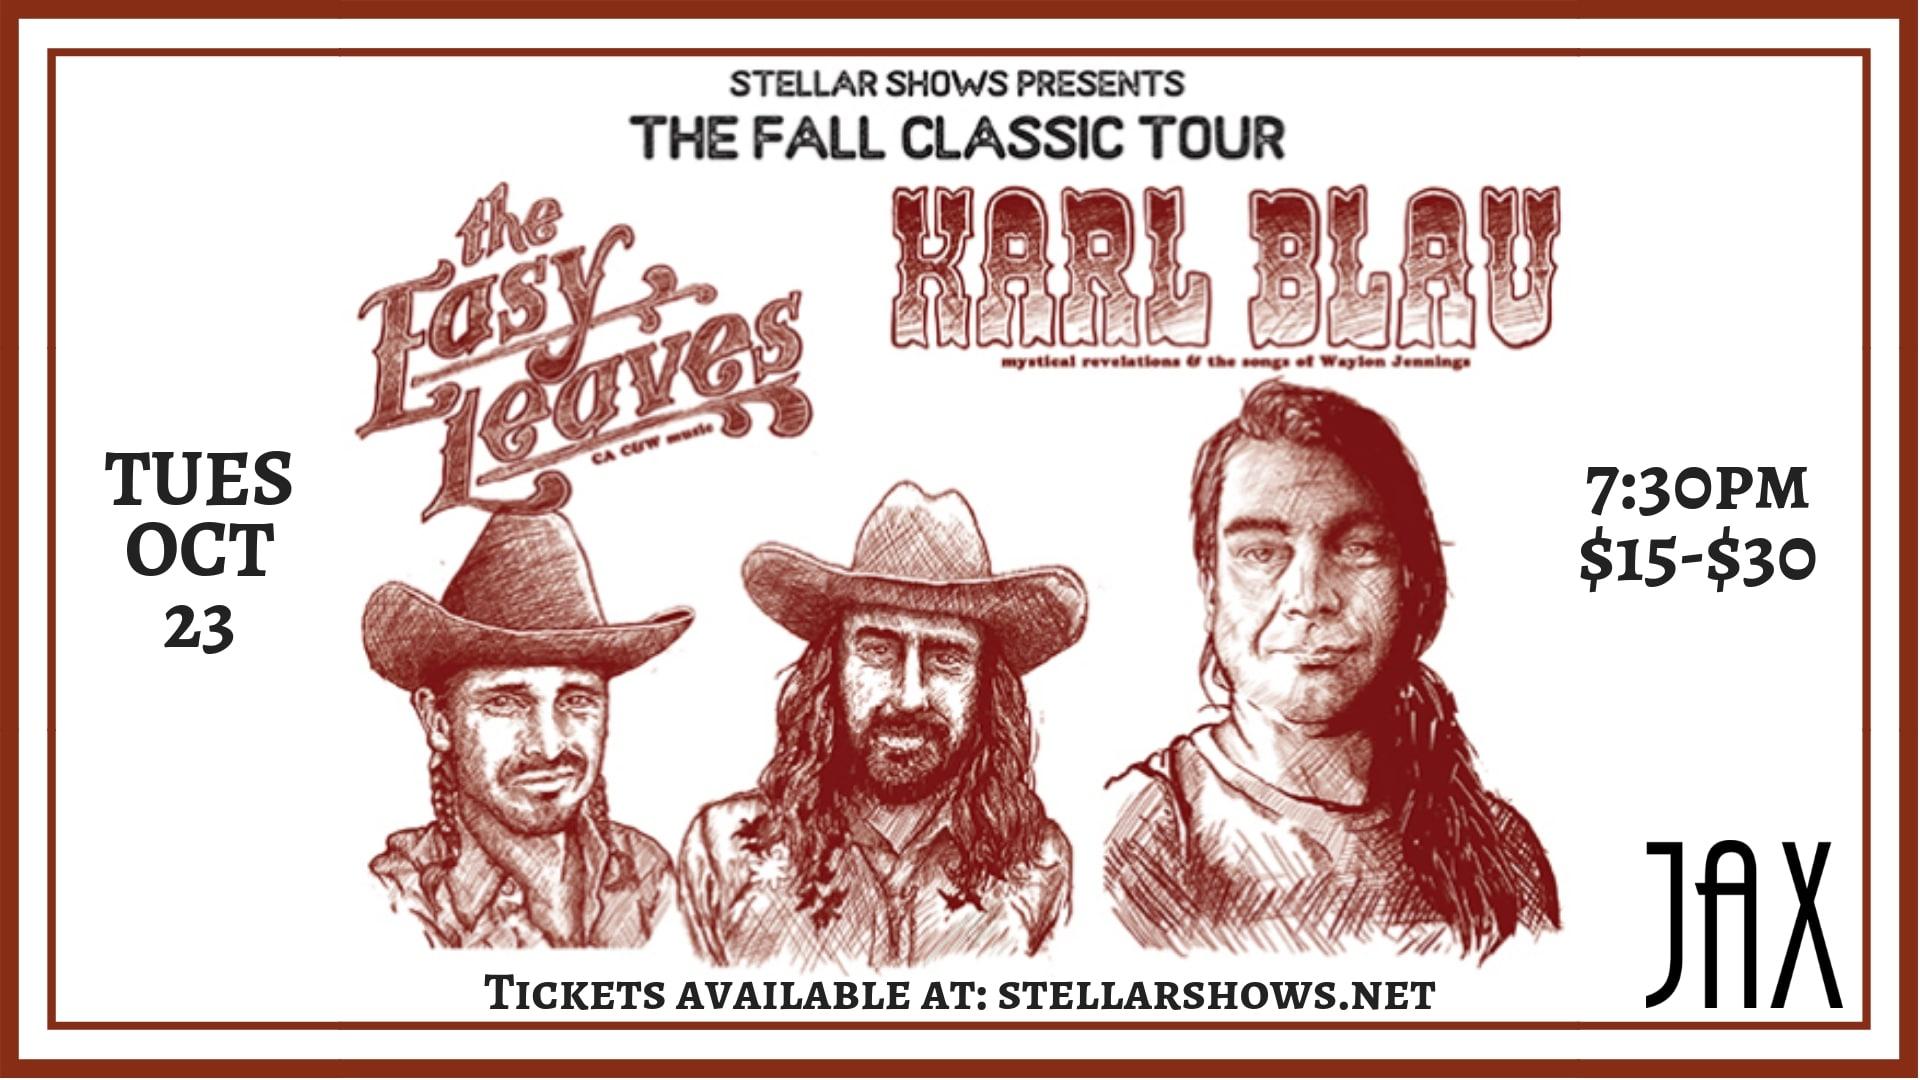 October 23 | KARL BLAU with THE EASY LEAVES - Presented By StellarShows